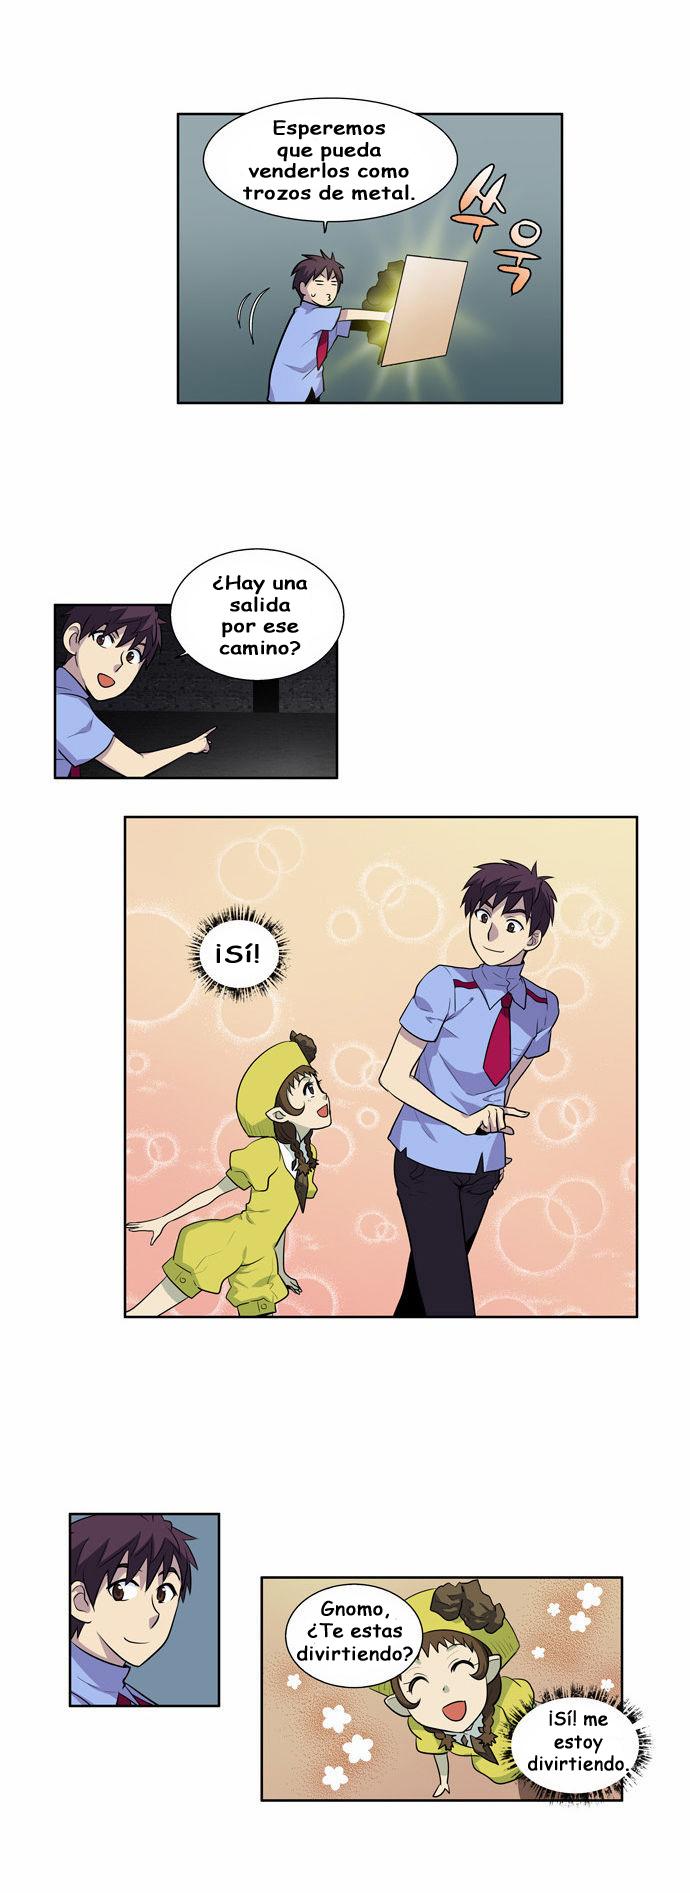 https://c5.ninemanga.com/es_manga/61/1725/396910/2a3d3ee7b160abddd6a60c9f1bb055cf.jpg Page 10